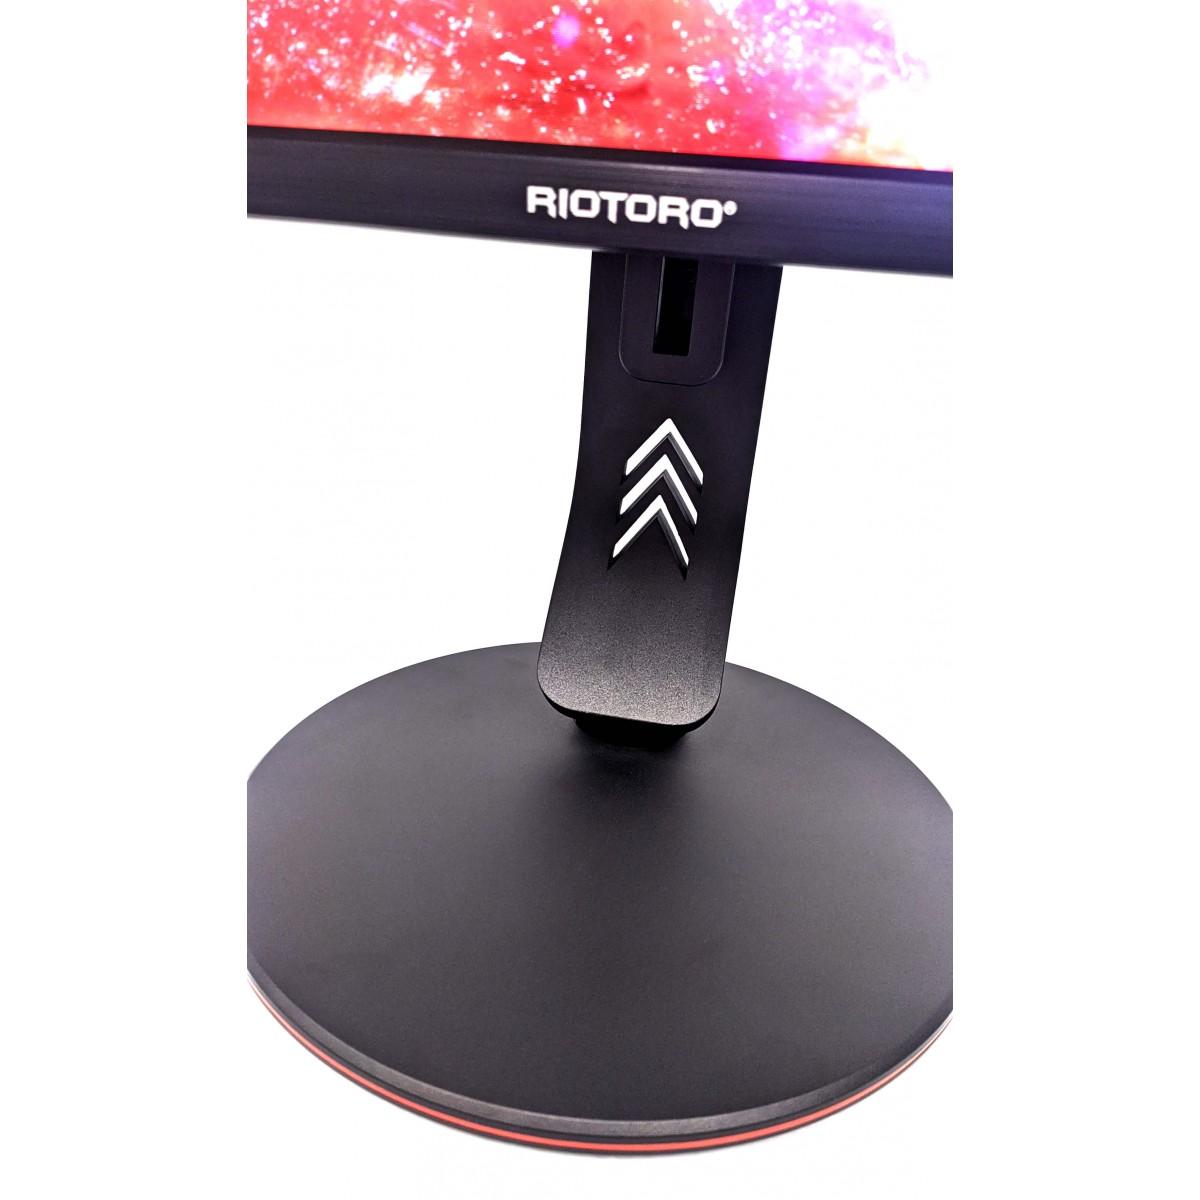 Monitor Gamer Riotoro, Stingray FX24, 24 Pol, FULL HD, HDR, FreeSync, 165Hz, 1ms, HDMI, DisplayPort, SR2385F